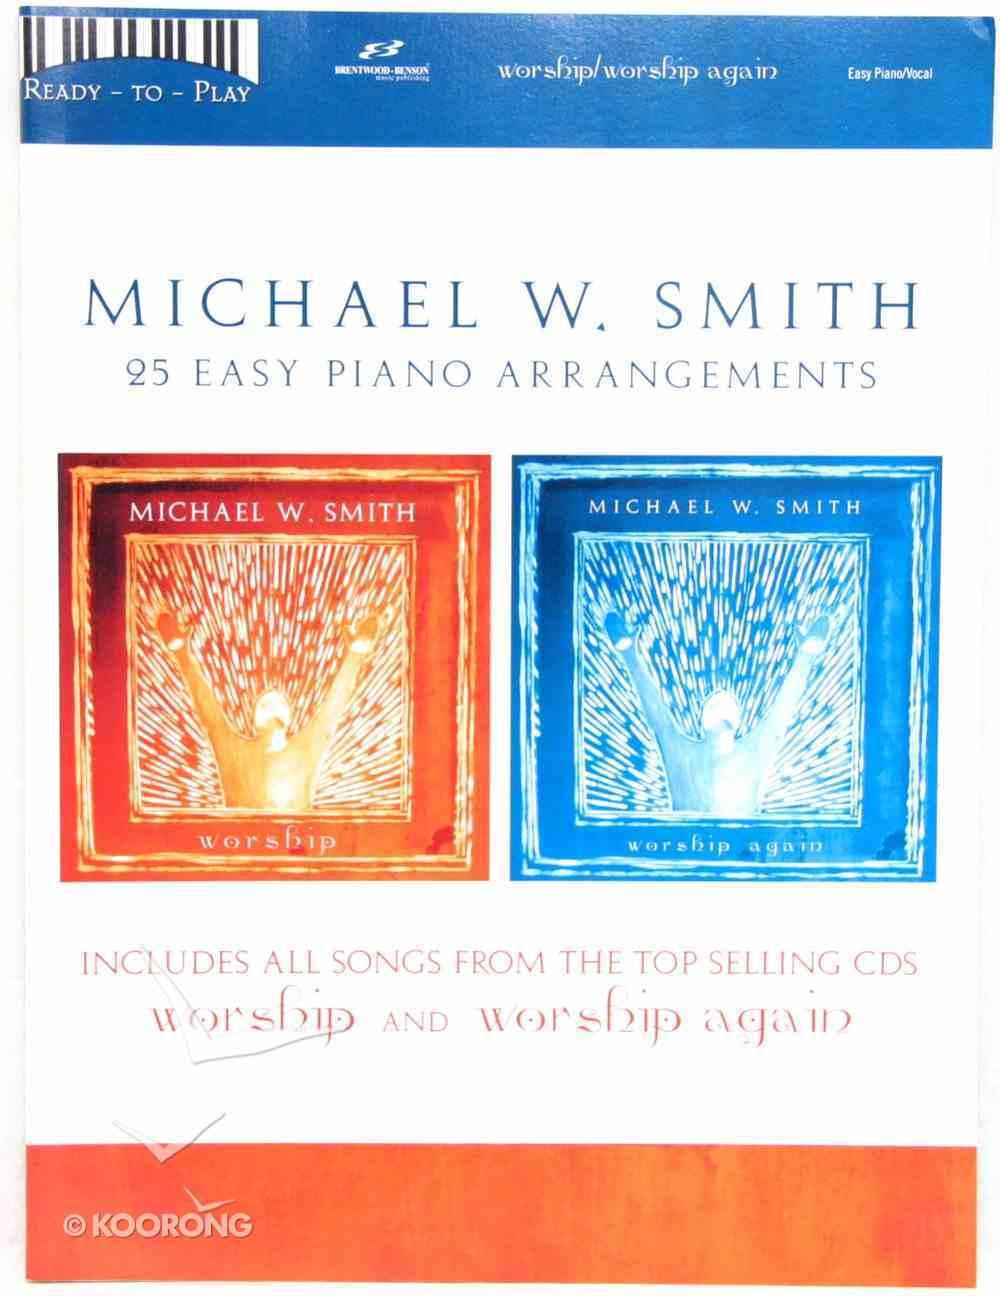 Worship & Worship Again Easy 2 Play Songbook Paperback